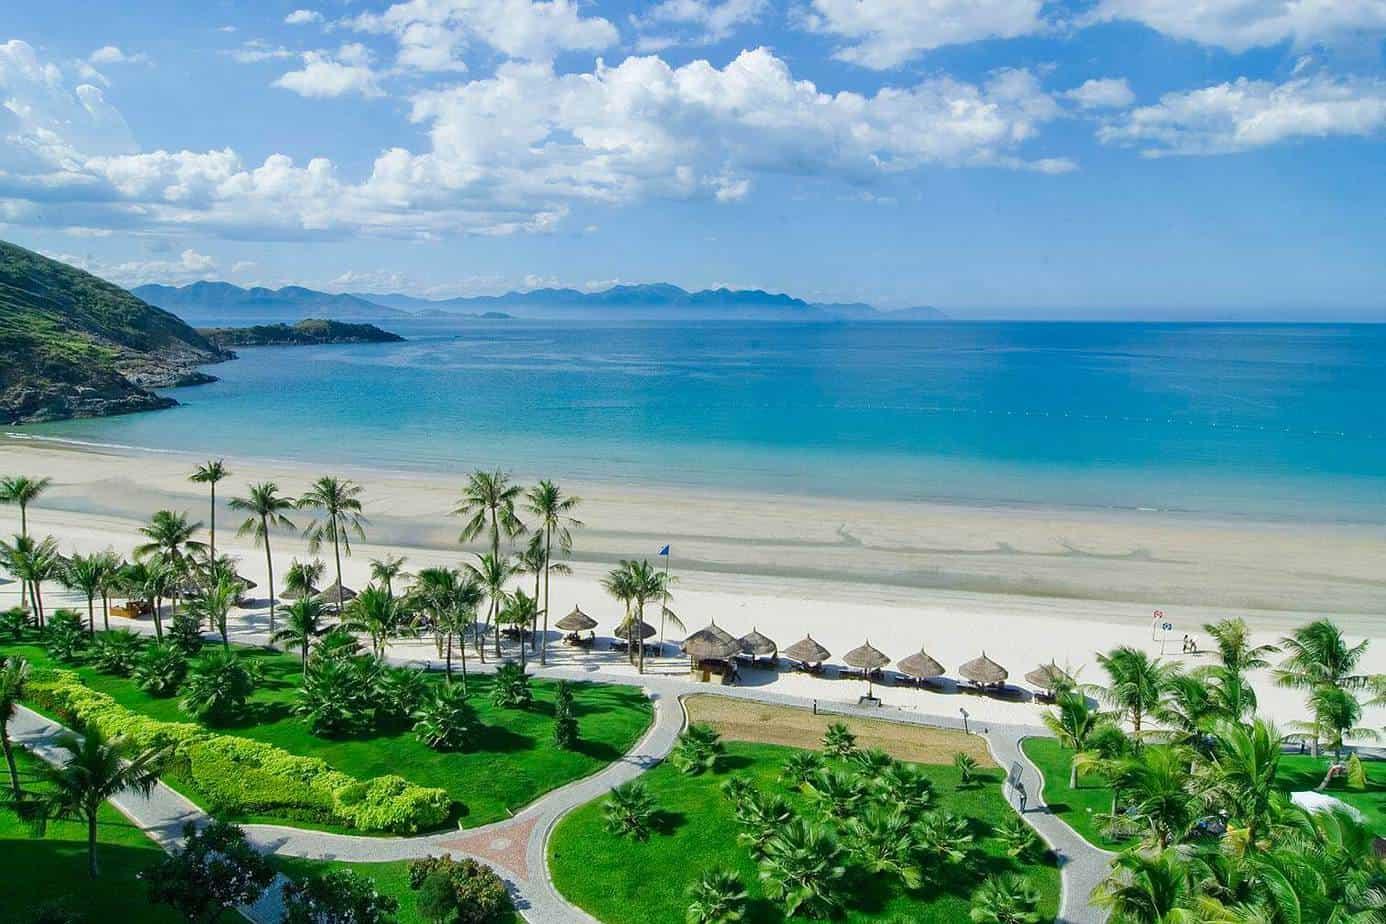 my-khe-beach-beautiful-beaches-in-da-nang